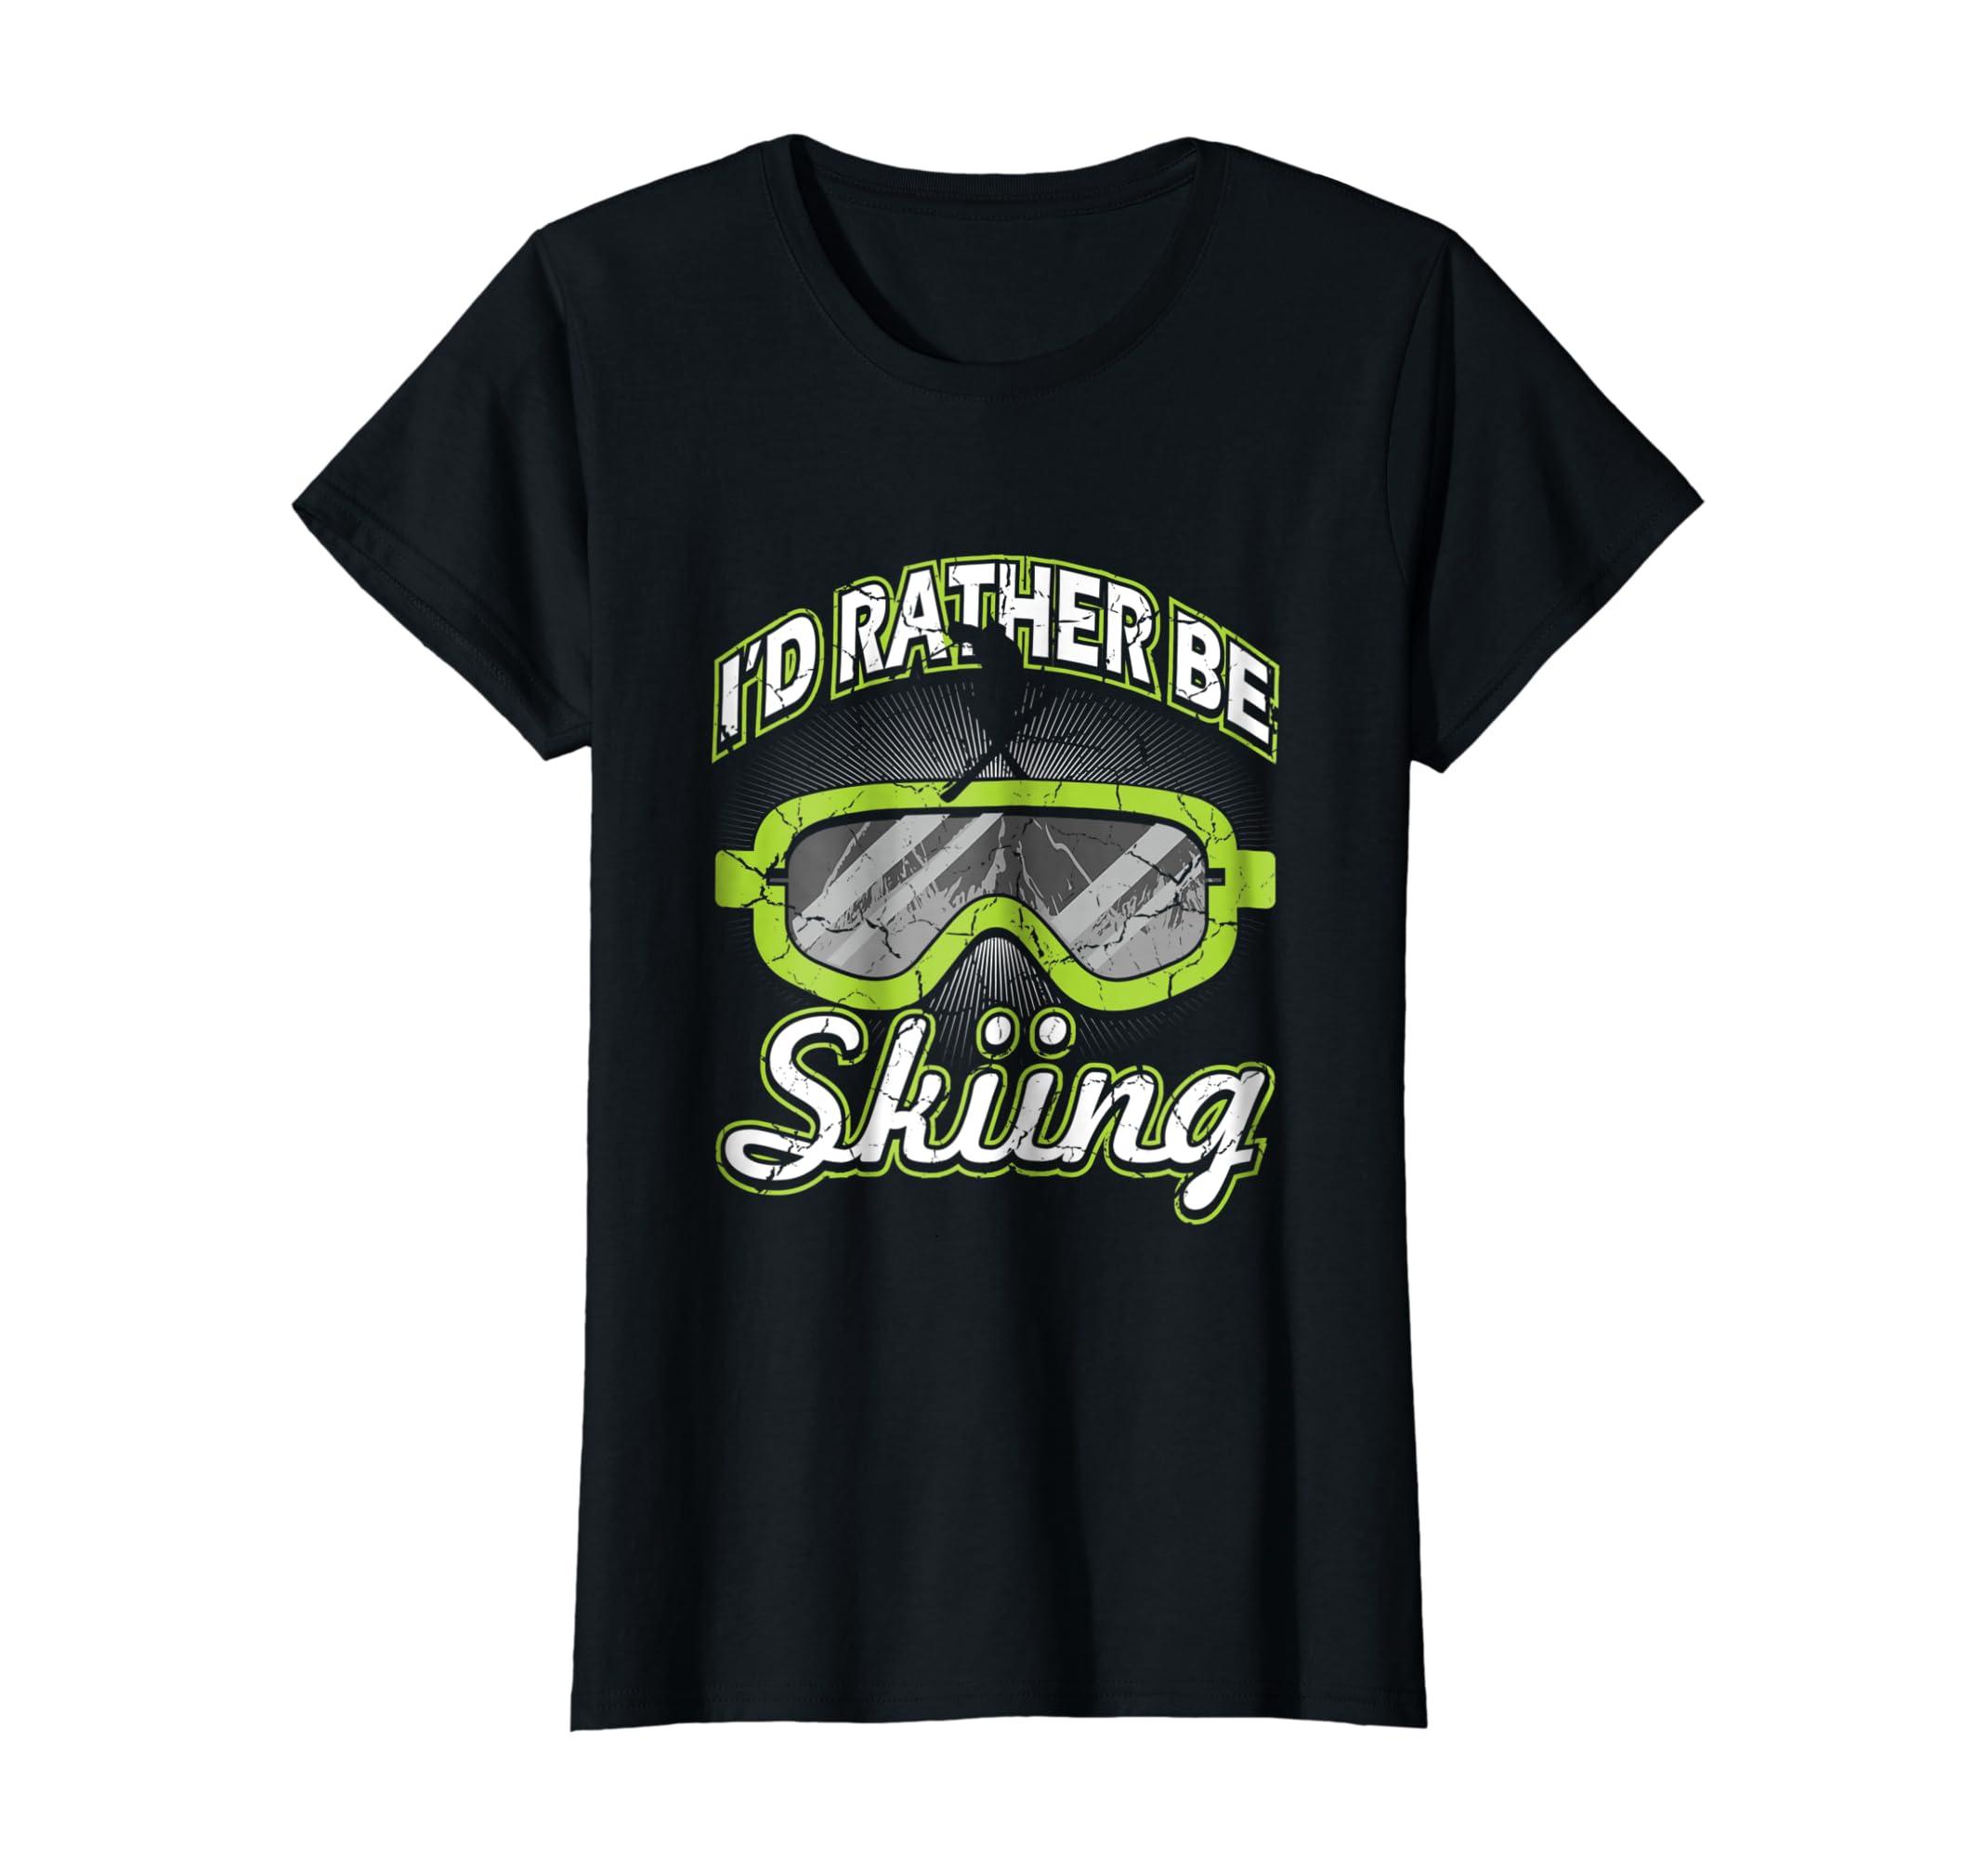 b184b8245 Amazon.com: I'd Rather Be Skiing T-Shirt Funny Ski Tee Skier Slopes Gift:  Clothing